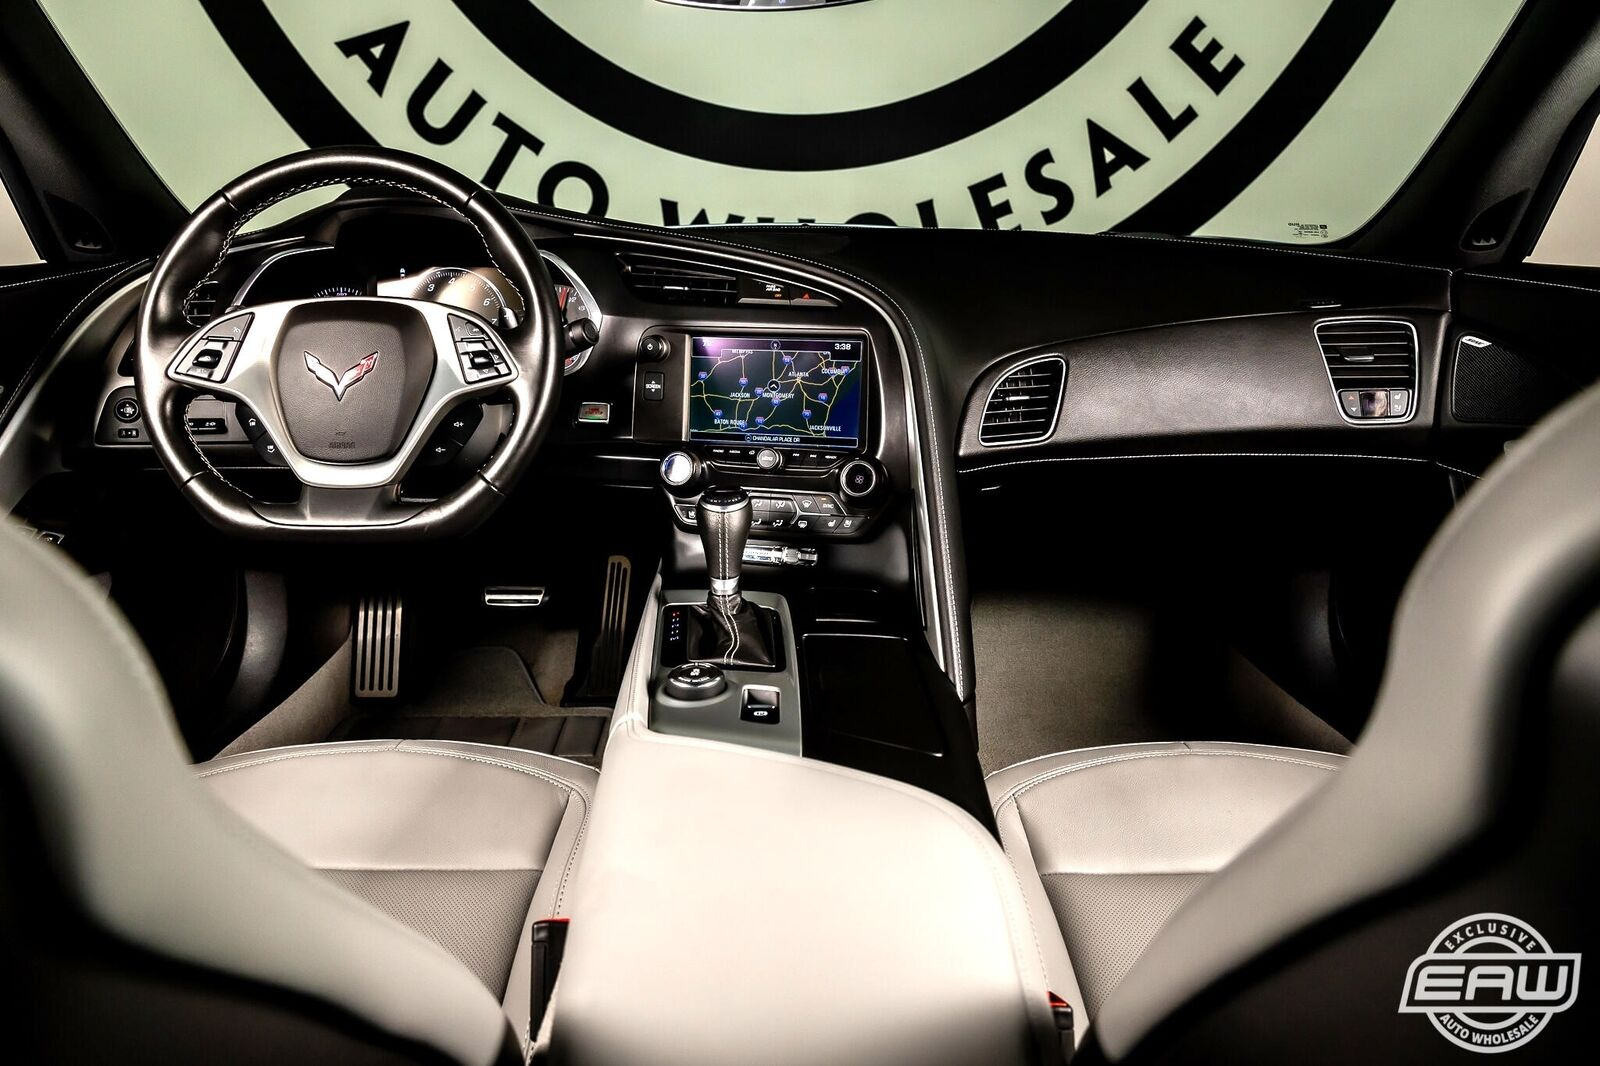 2017 Silver Chevrolet Corvette Grand Sport 2LT | C7 Corvette Photo 2